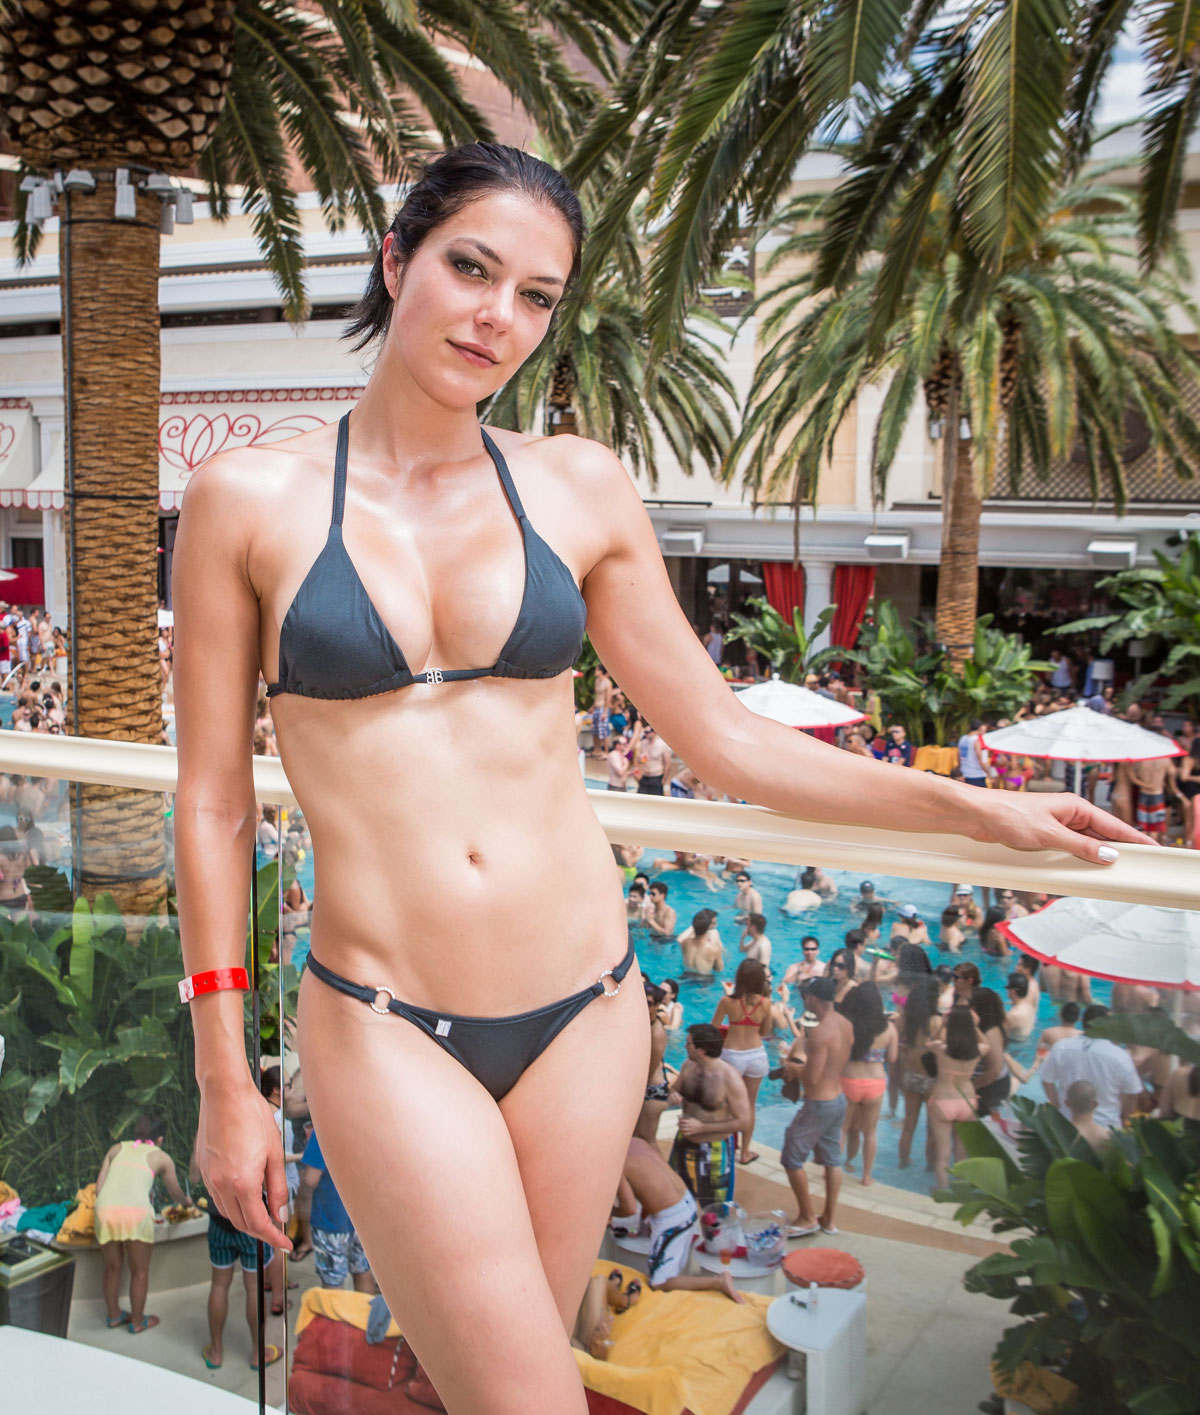 Bikini Adrienne Curry nude photos 2019